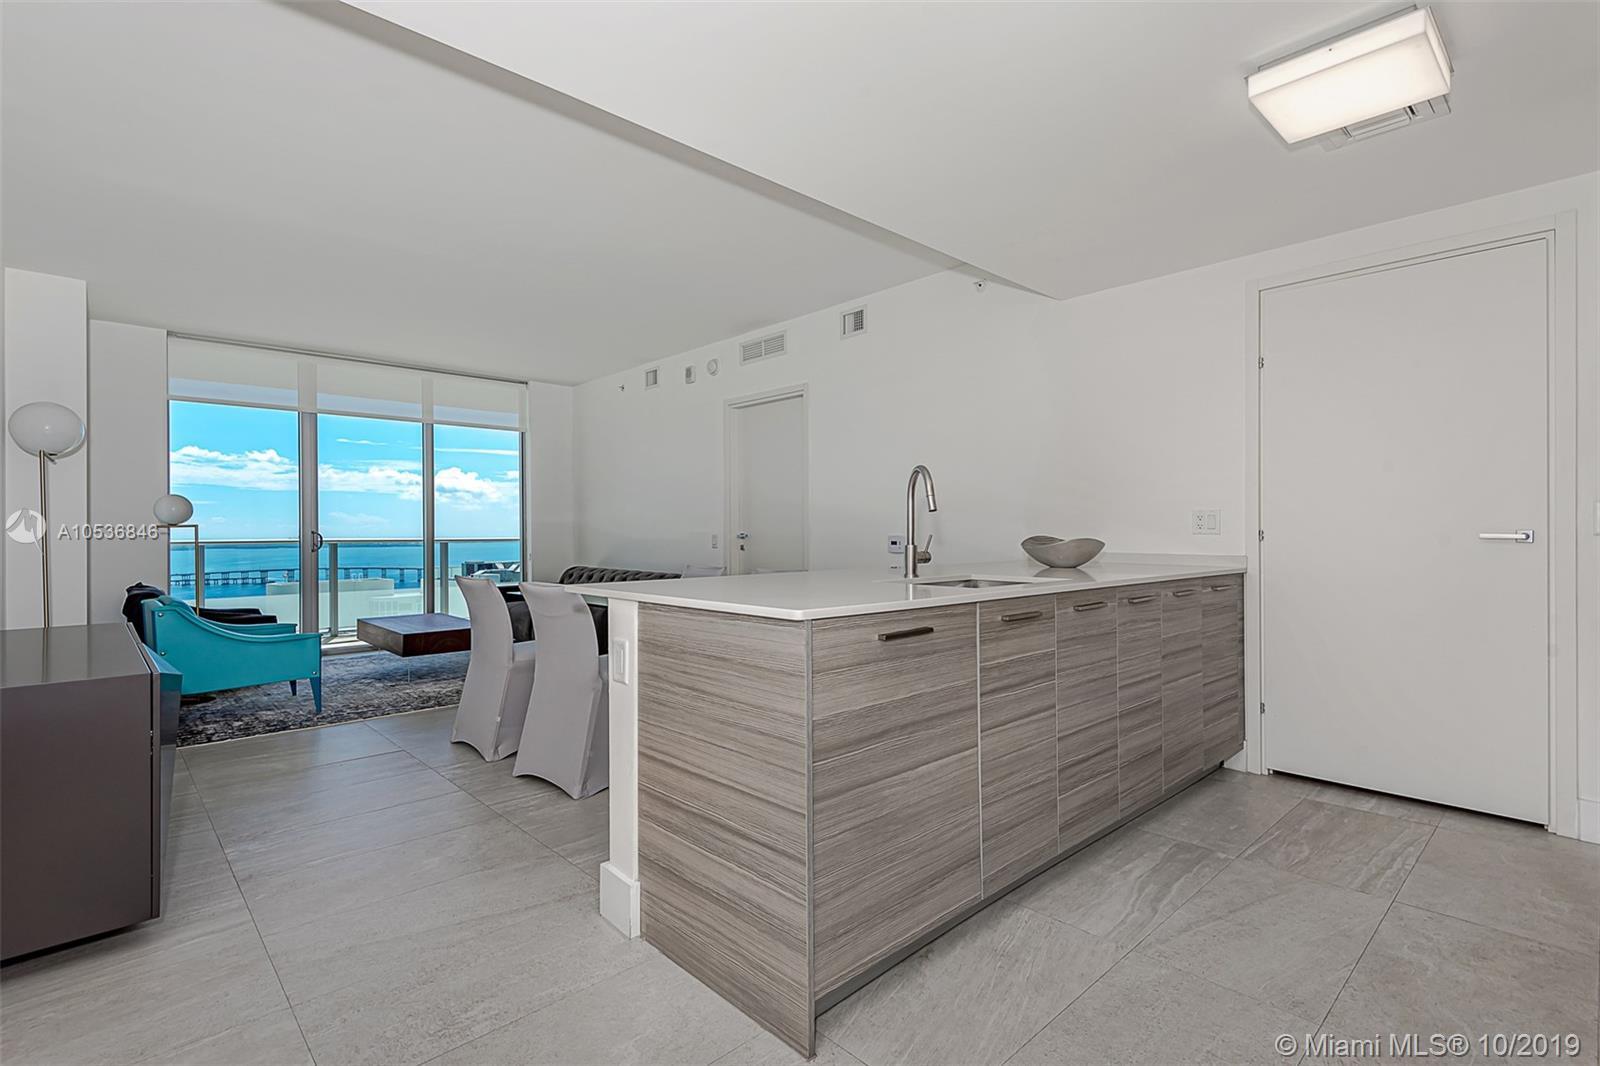 1300 Brickell Bay Drive, Miami, FL 33131, Brickell House #3104, Brickell, Miami A10536846 image #7